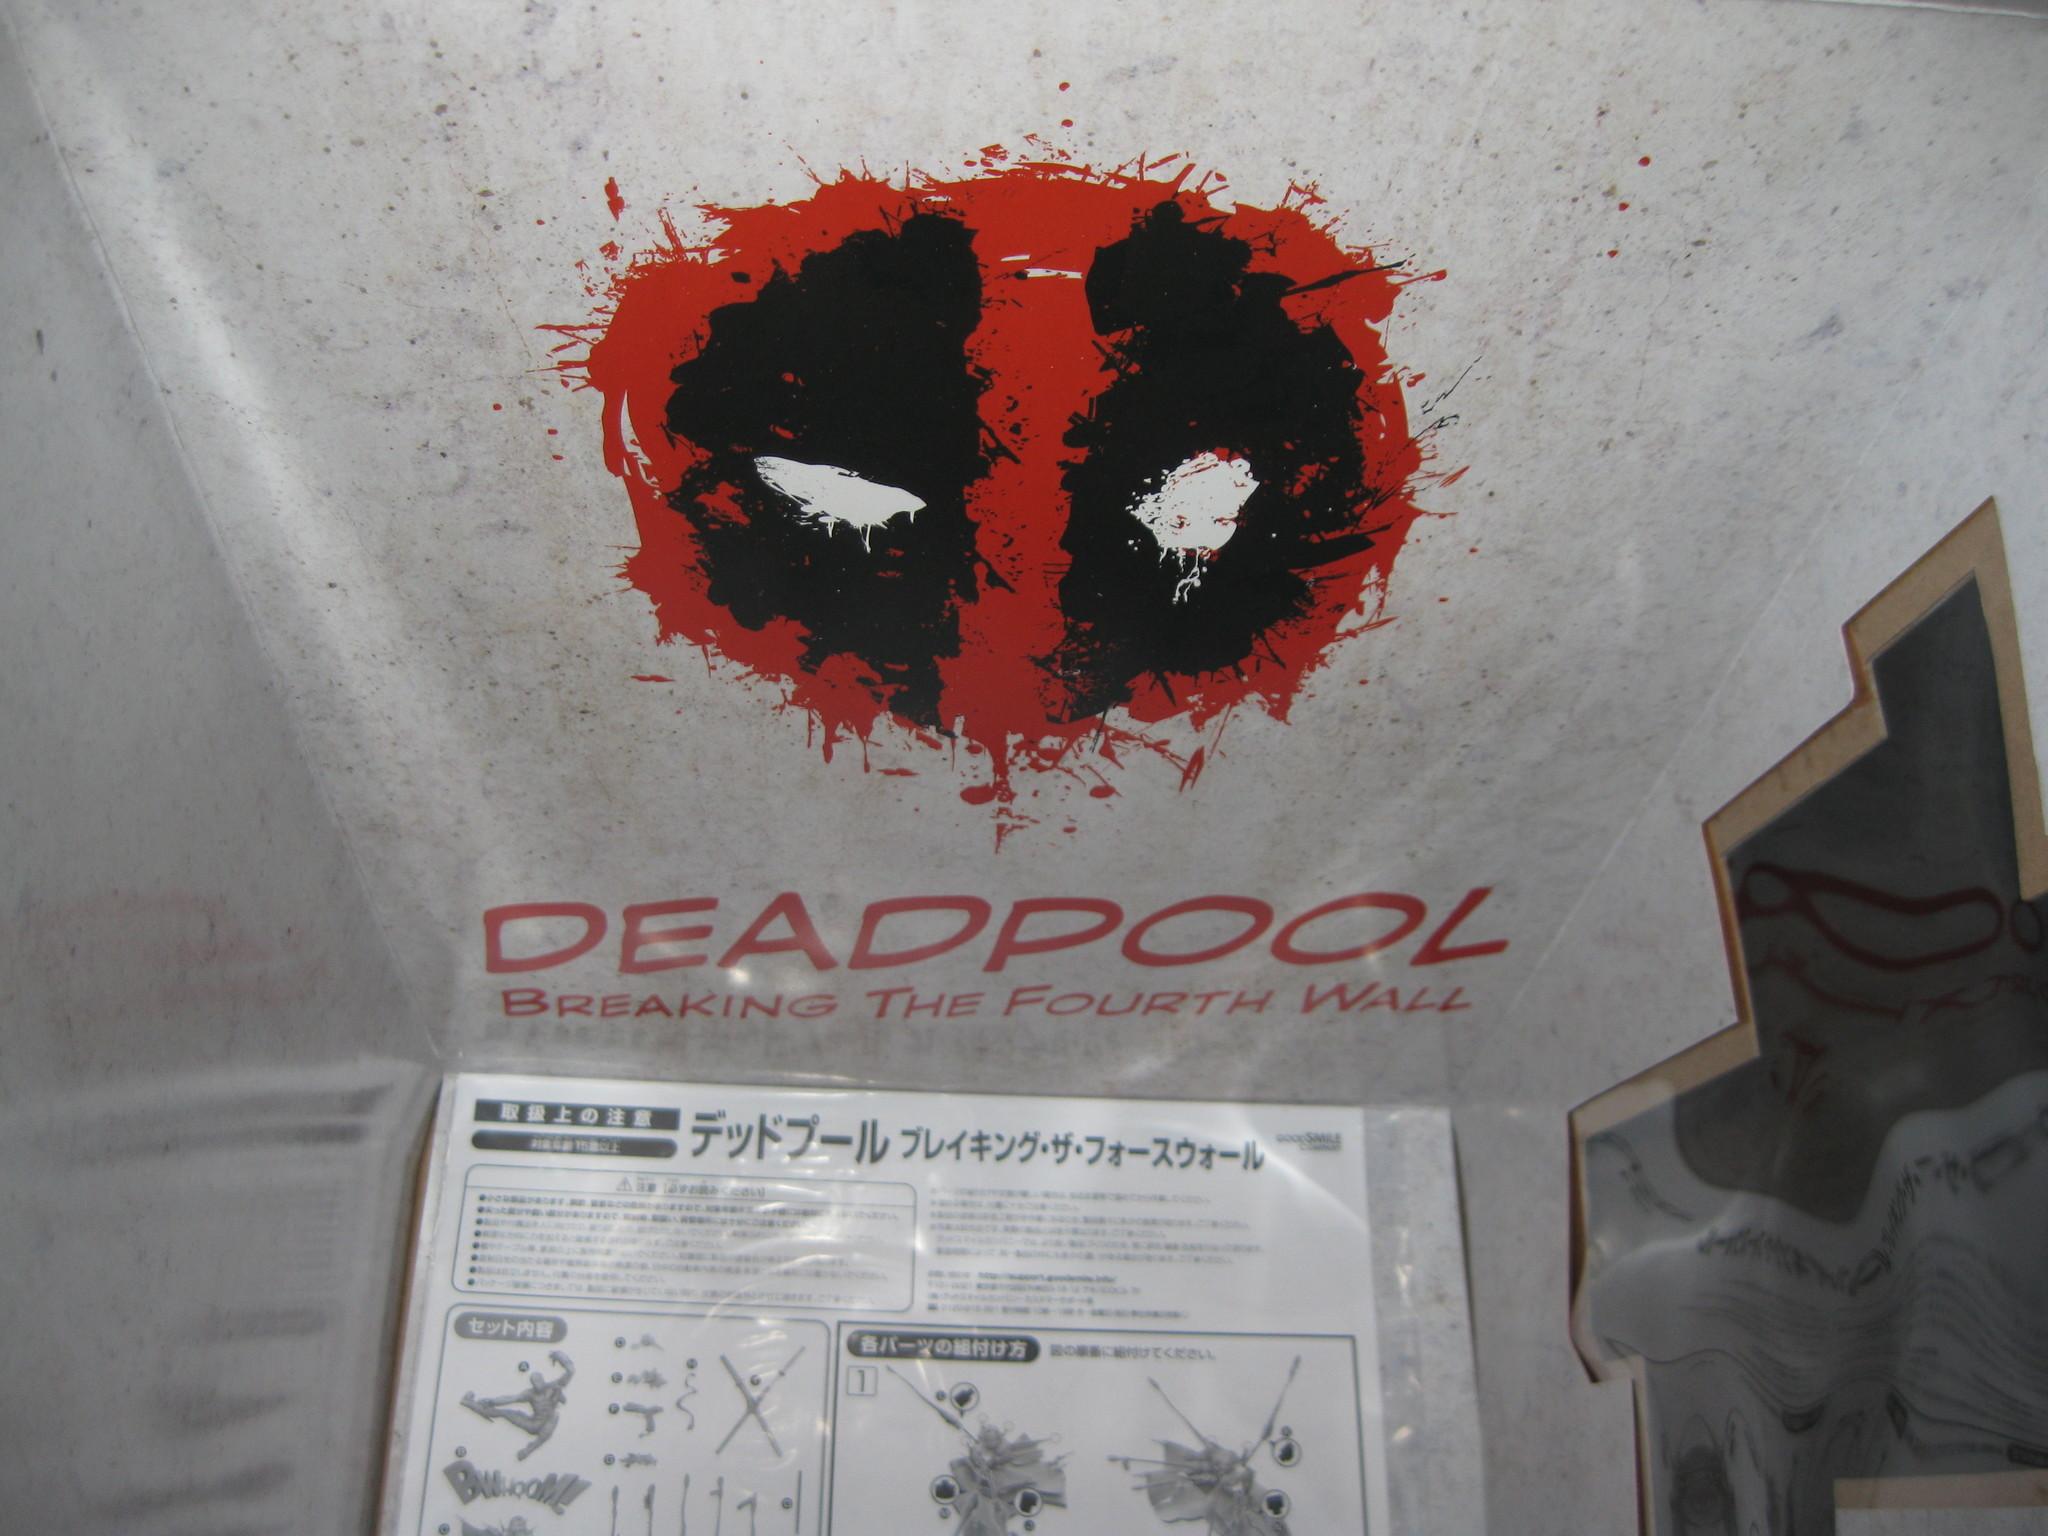 good_smile_company deadpool tashiro_kouji koyama_shigeto